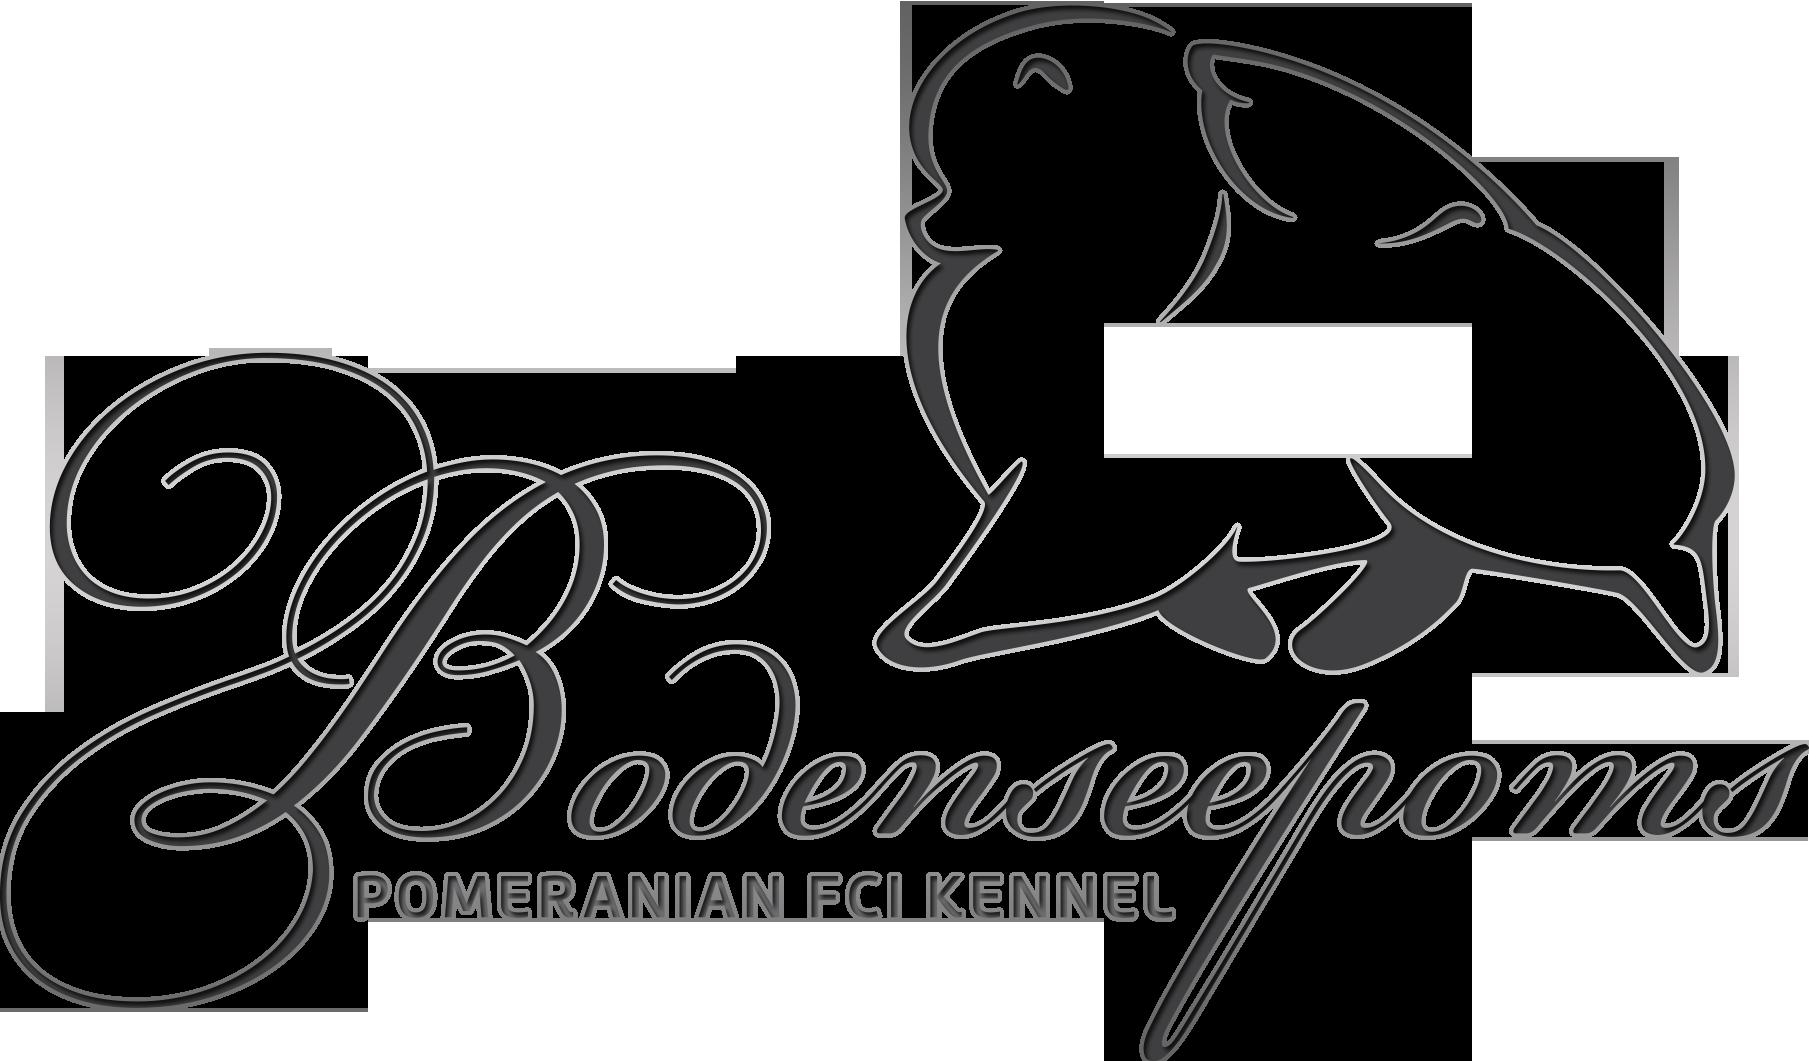 Bodenseepoms.com